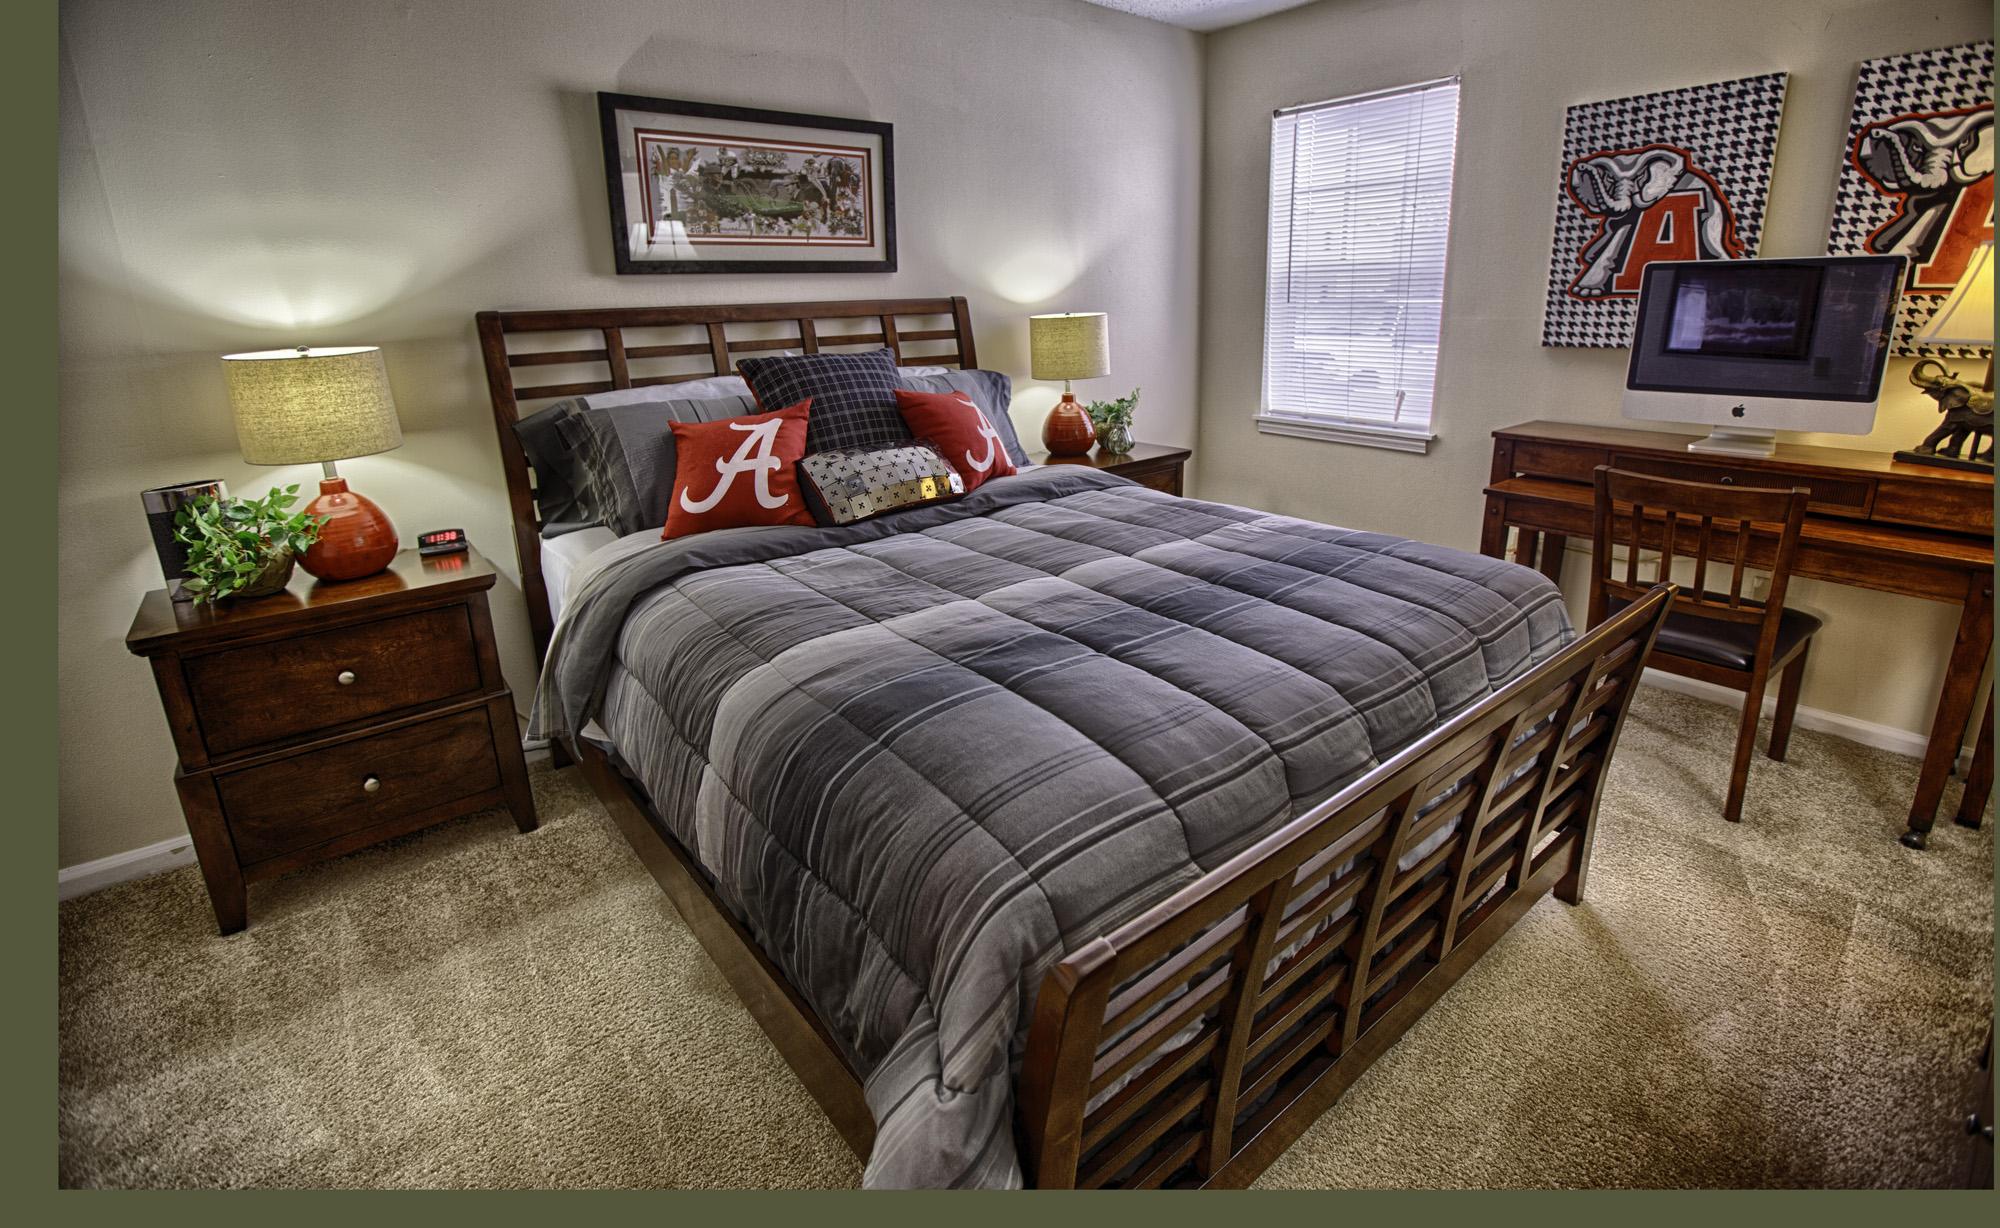 1 Bedroom Apartments Tuscaloosa ~ cryp.us